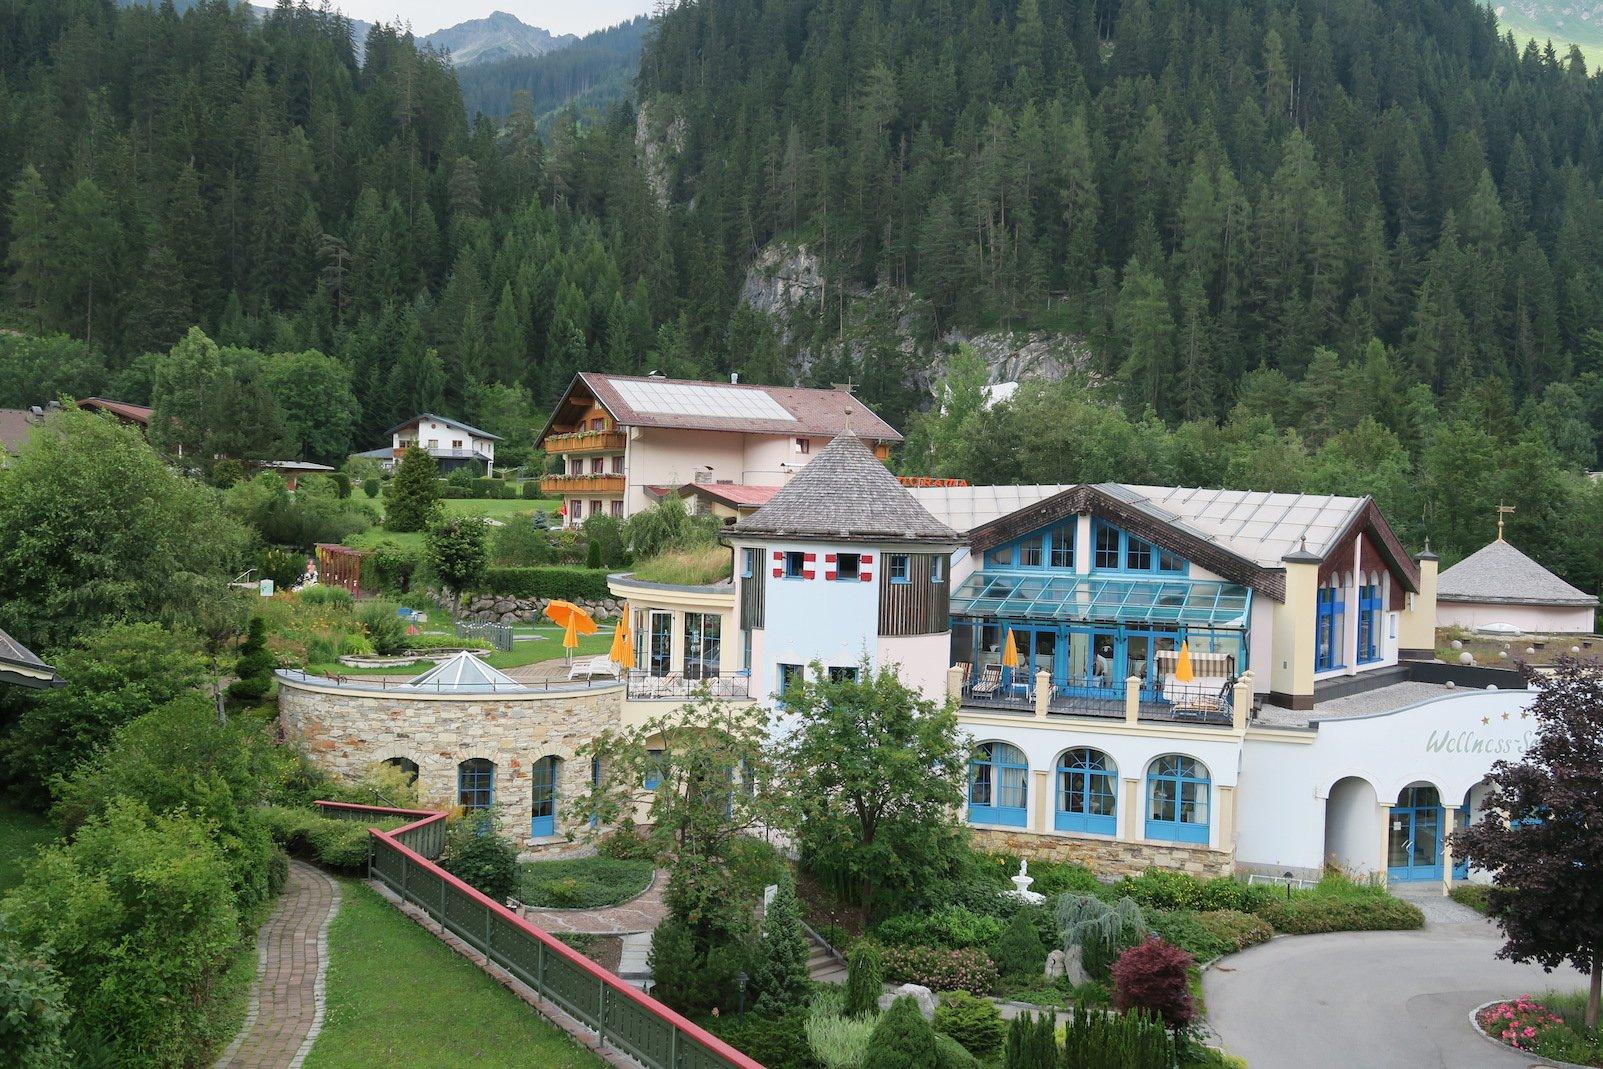 Blick zur Wellnesslandschaft des Hotels Alpenrose in Elbigenalp